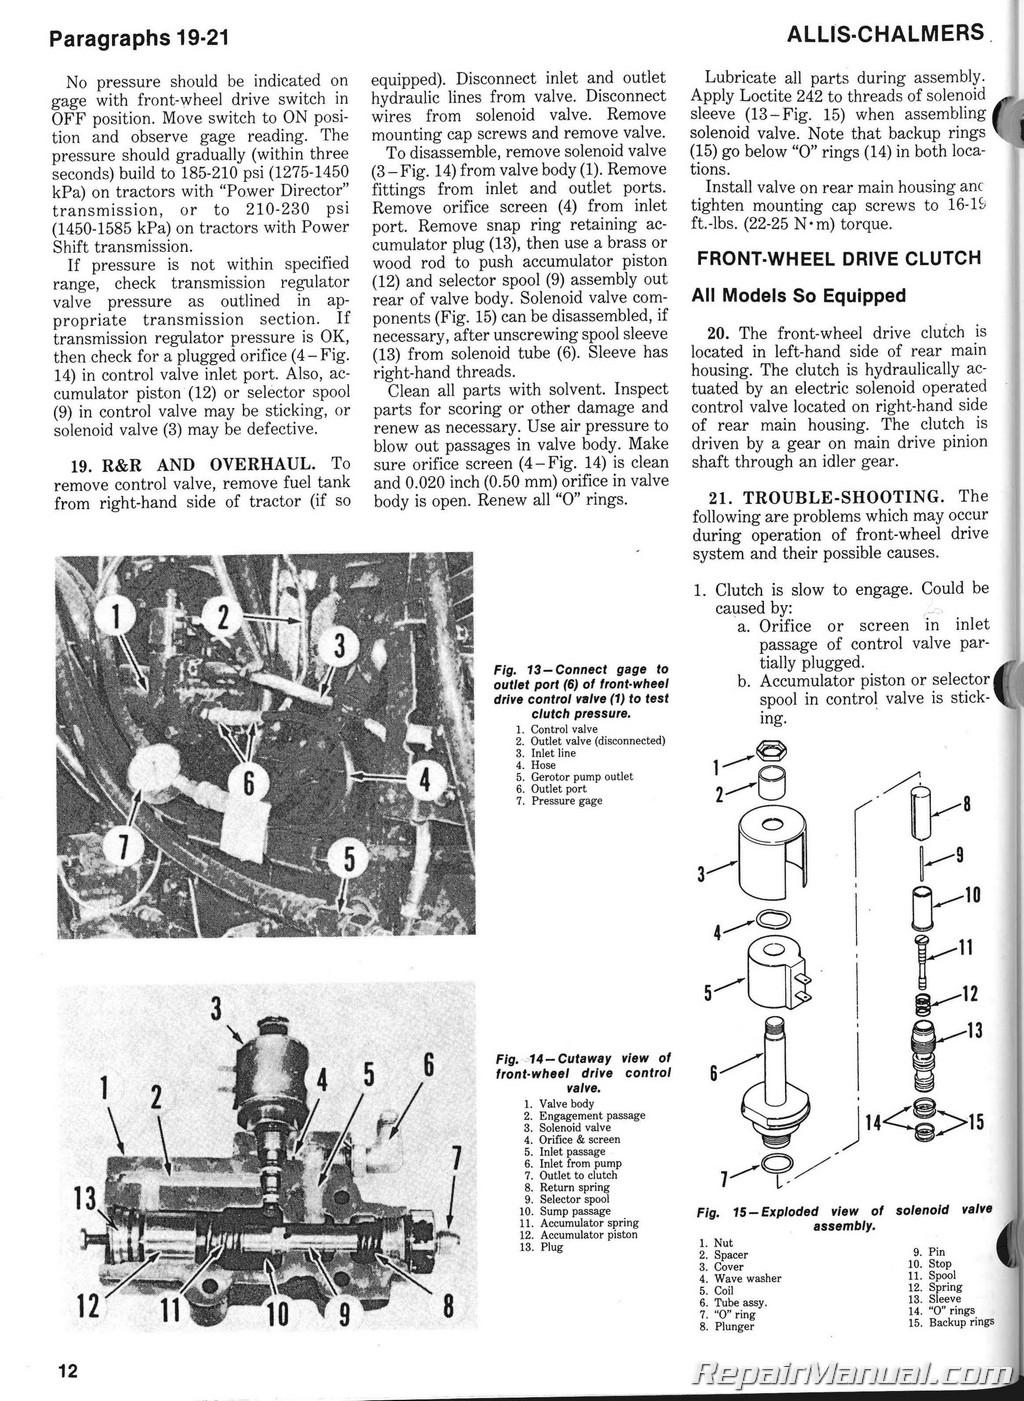 allis chalmers wd wiring schematic diagram ford 9n wiring